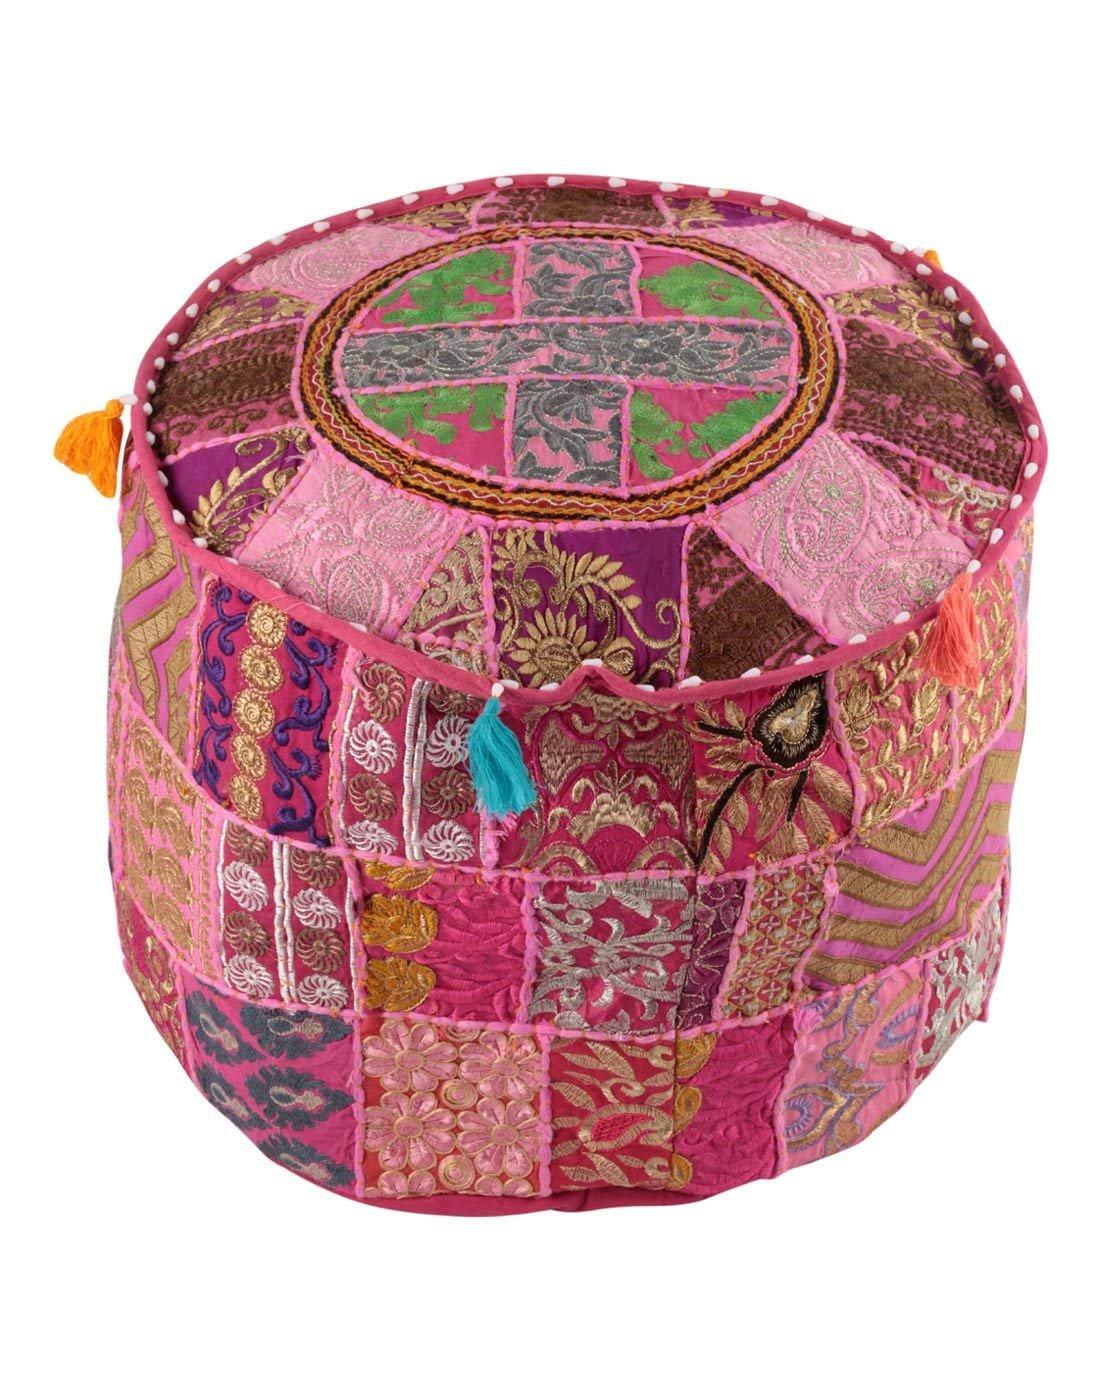 GANESHAM Indian Home & Living Decor Hippie Patchwork Bean Bag Boho Bohemian Hand Embroidered Ethnic Handmade Pouf Ottoman Vintage Cotton Floor Pillow & Cushion (22 inch dia.)